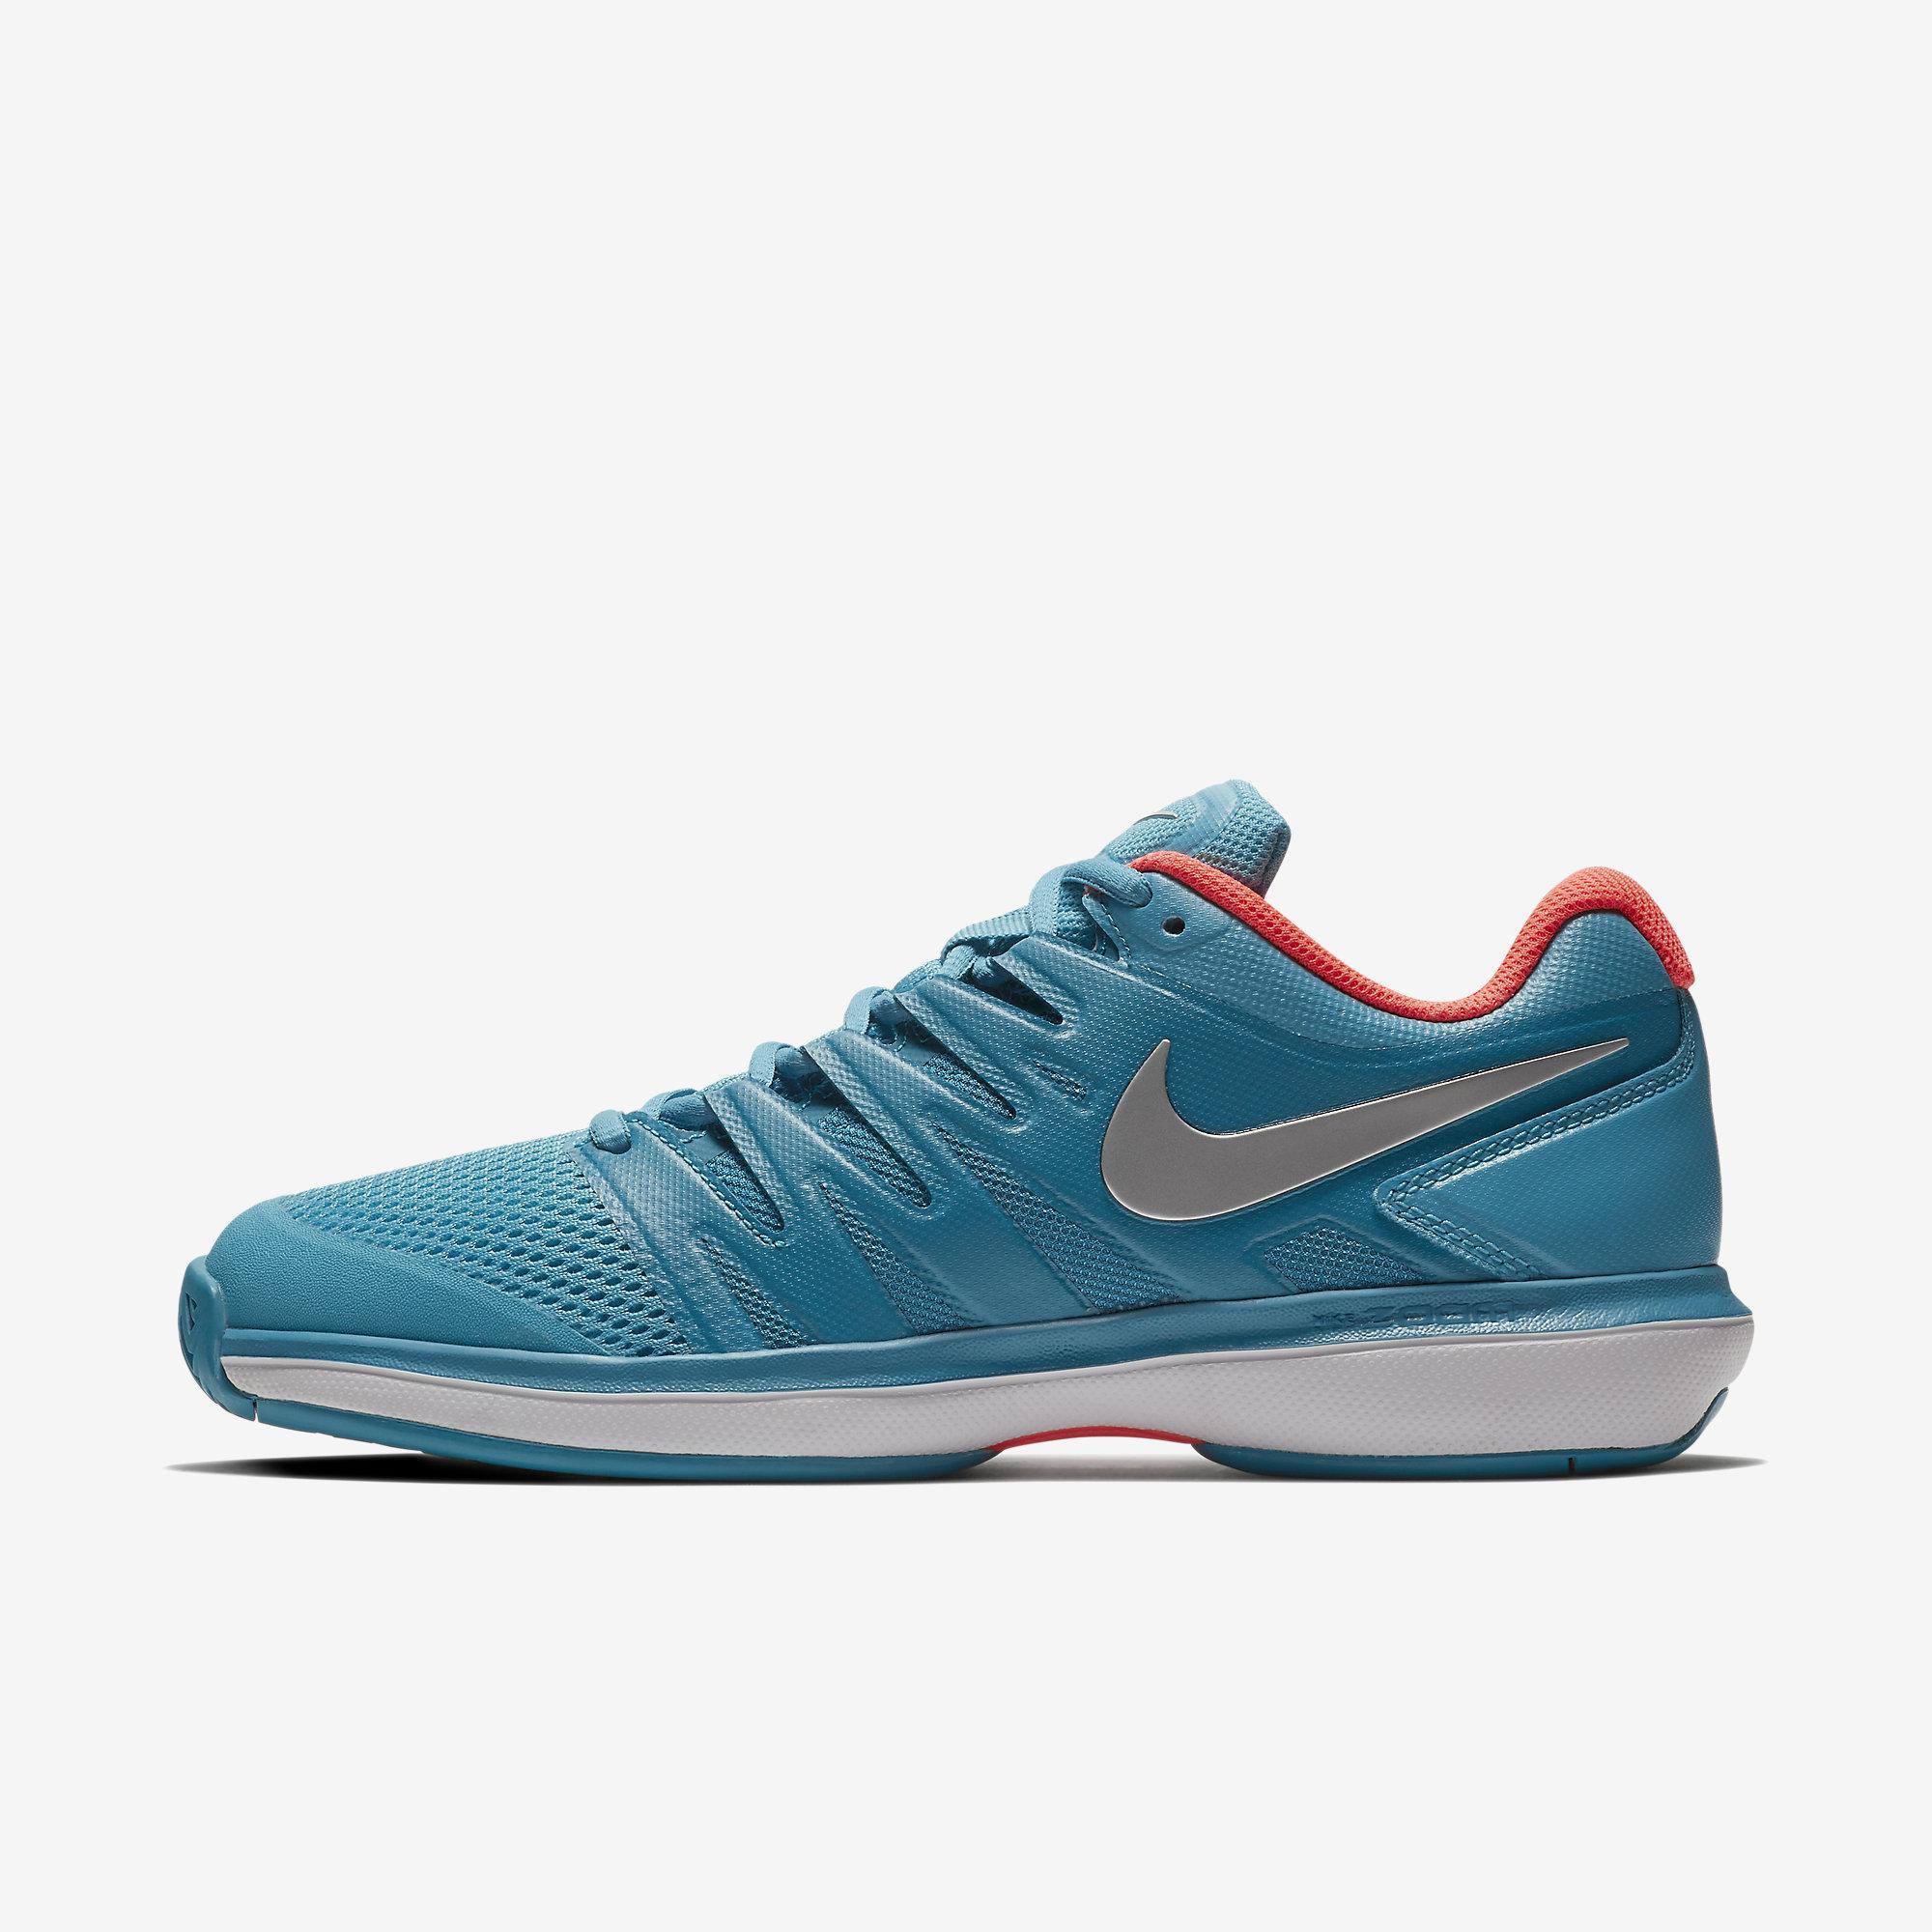 251658ece8c5 Nike Womens Air Zoom Prestige Tennis Shoes - Light Blue Fury Neo Turquoise  - Tennisnuts.com